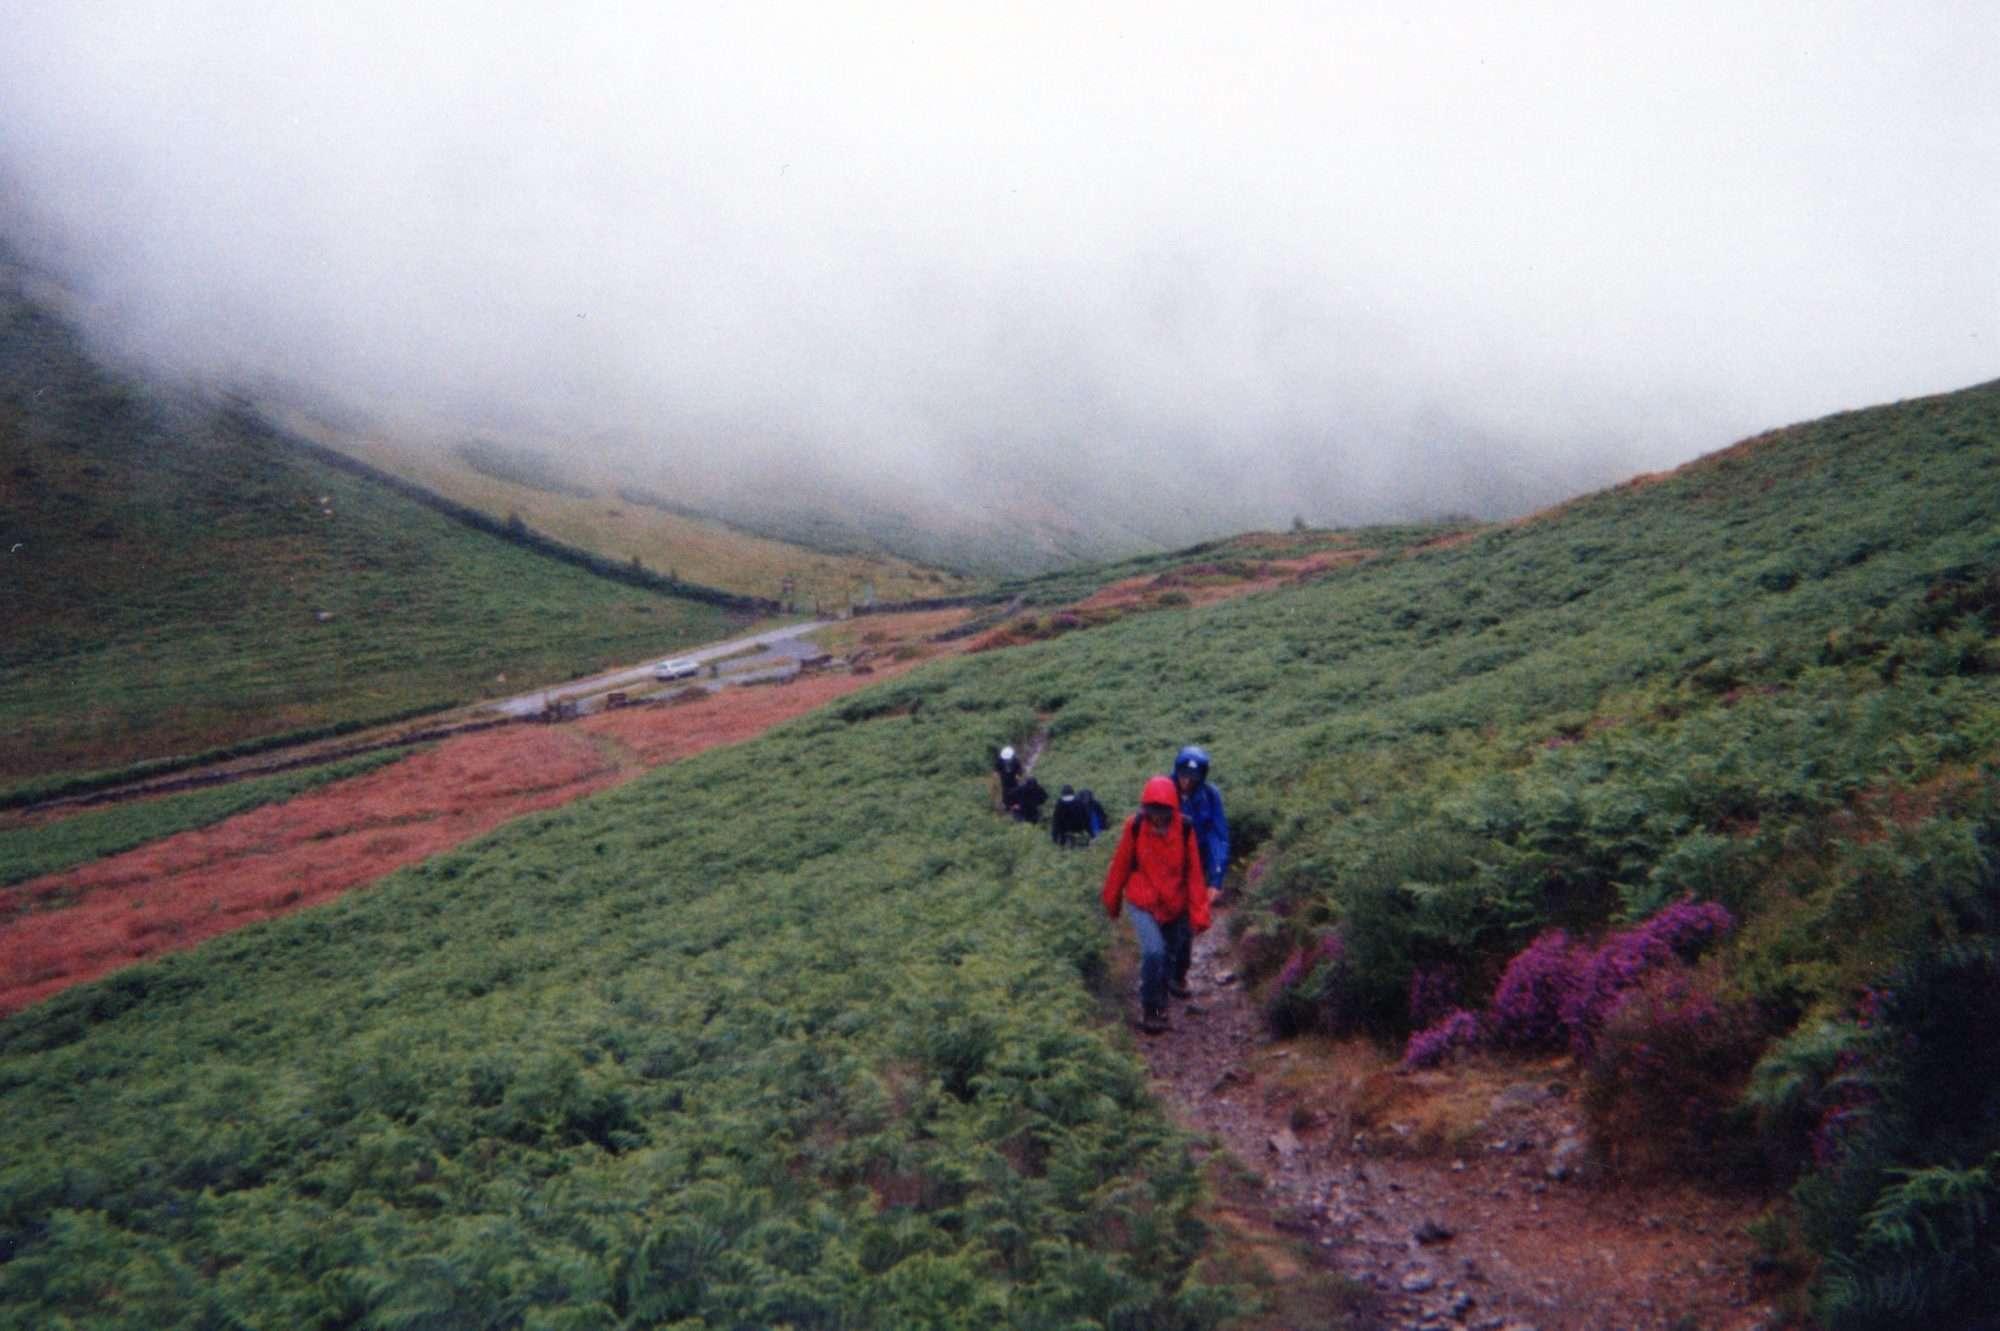 Misty day hiking up hillside